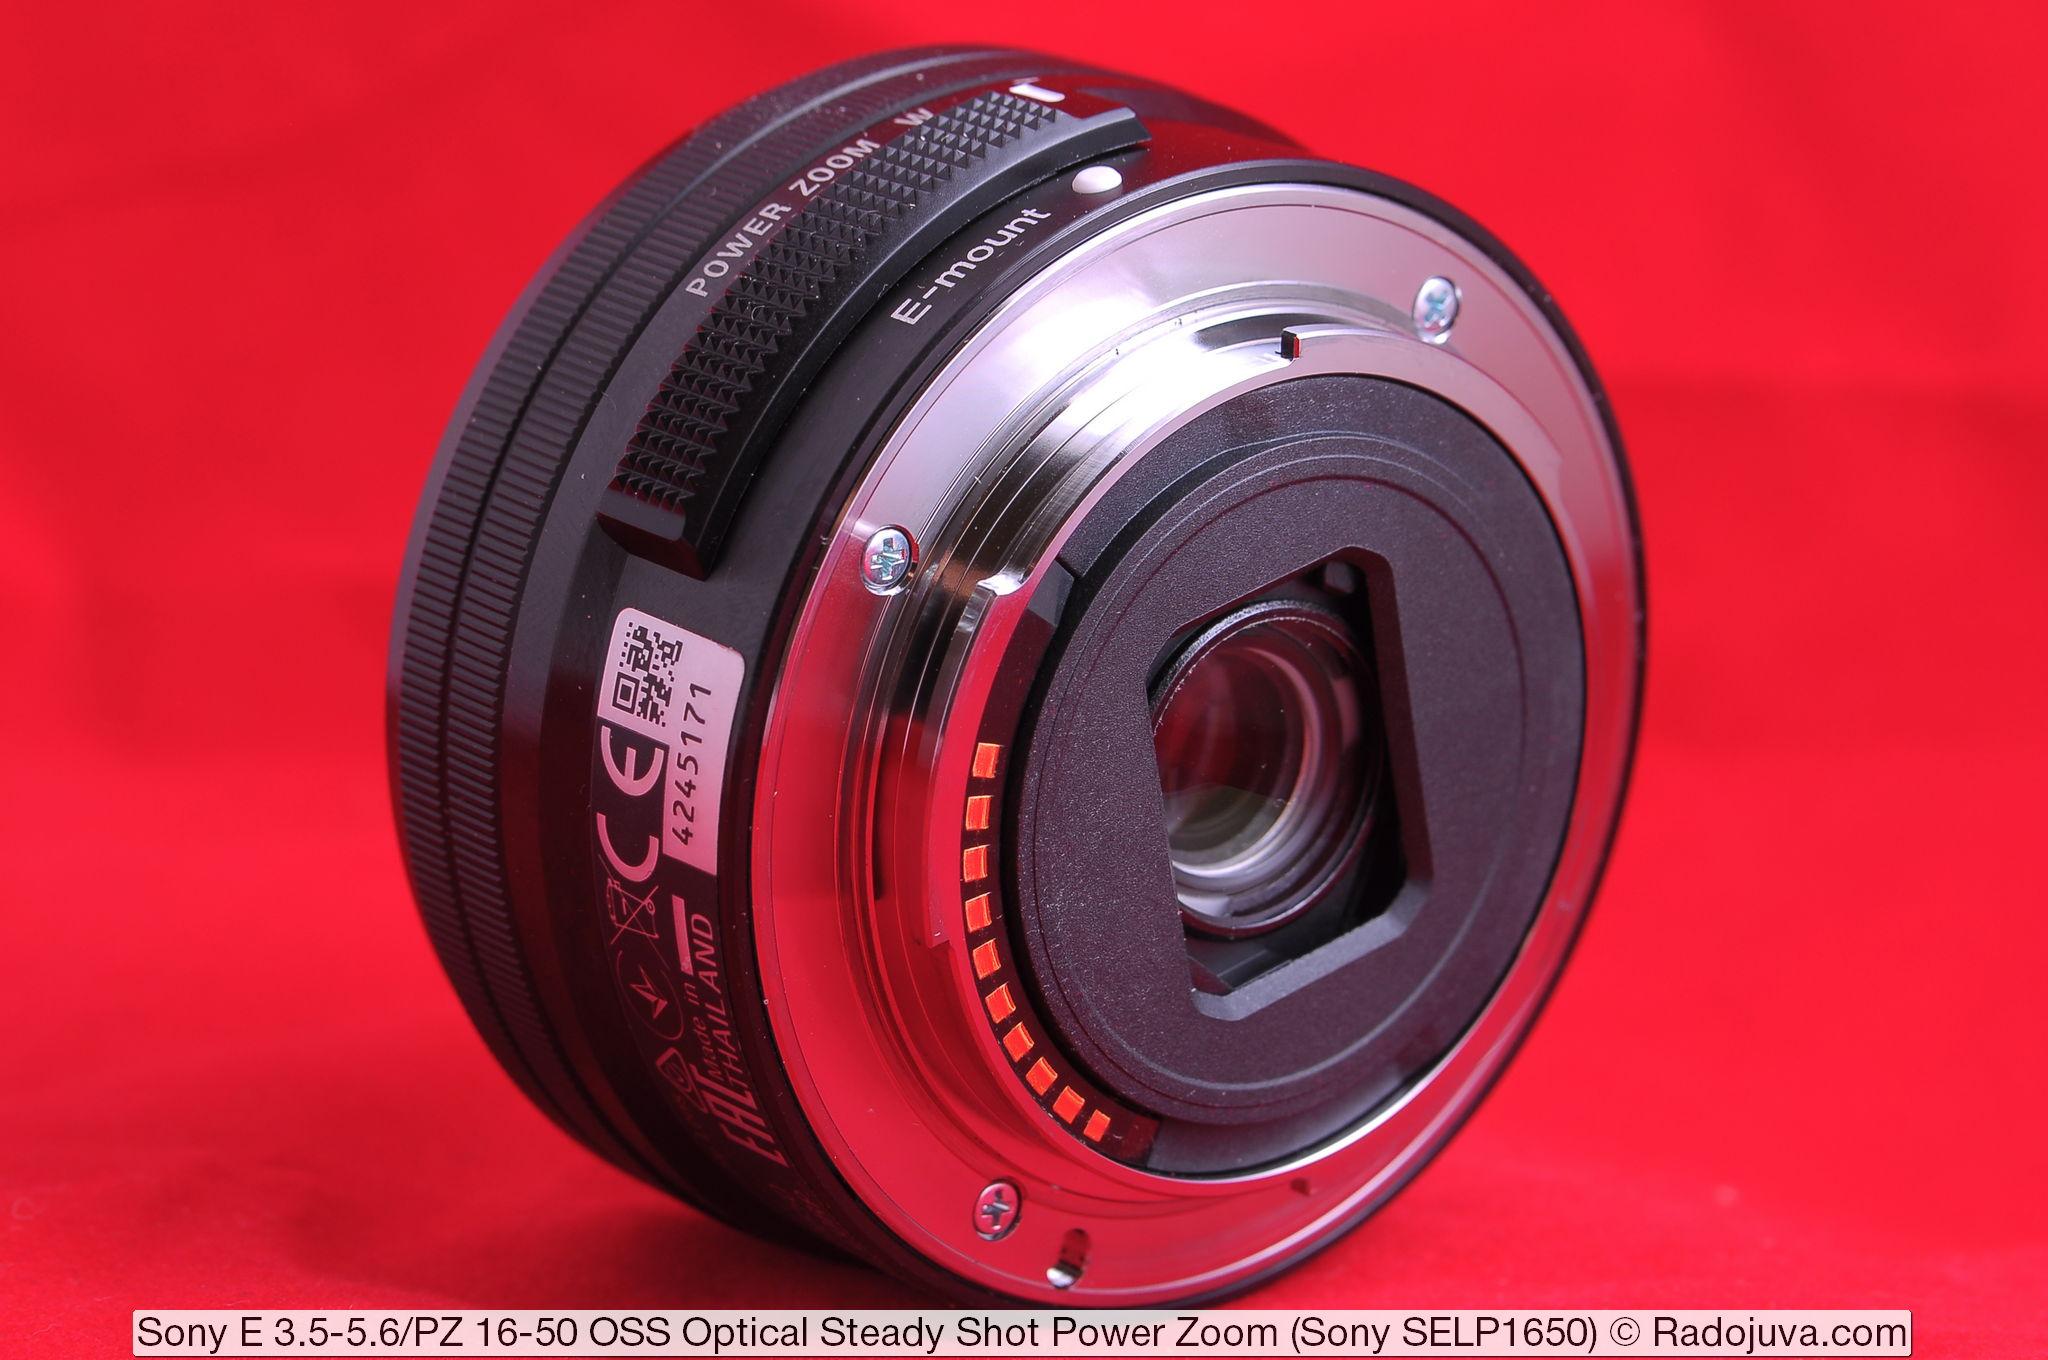 Sony E 3.5-5.6/PZ 16-50 OSS Optical Steady Shot Power Zoom (Sony SELP1650)